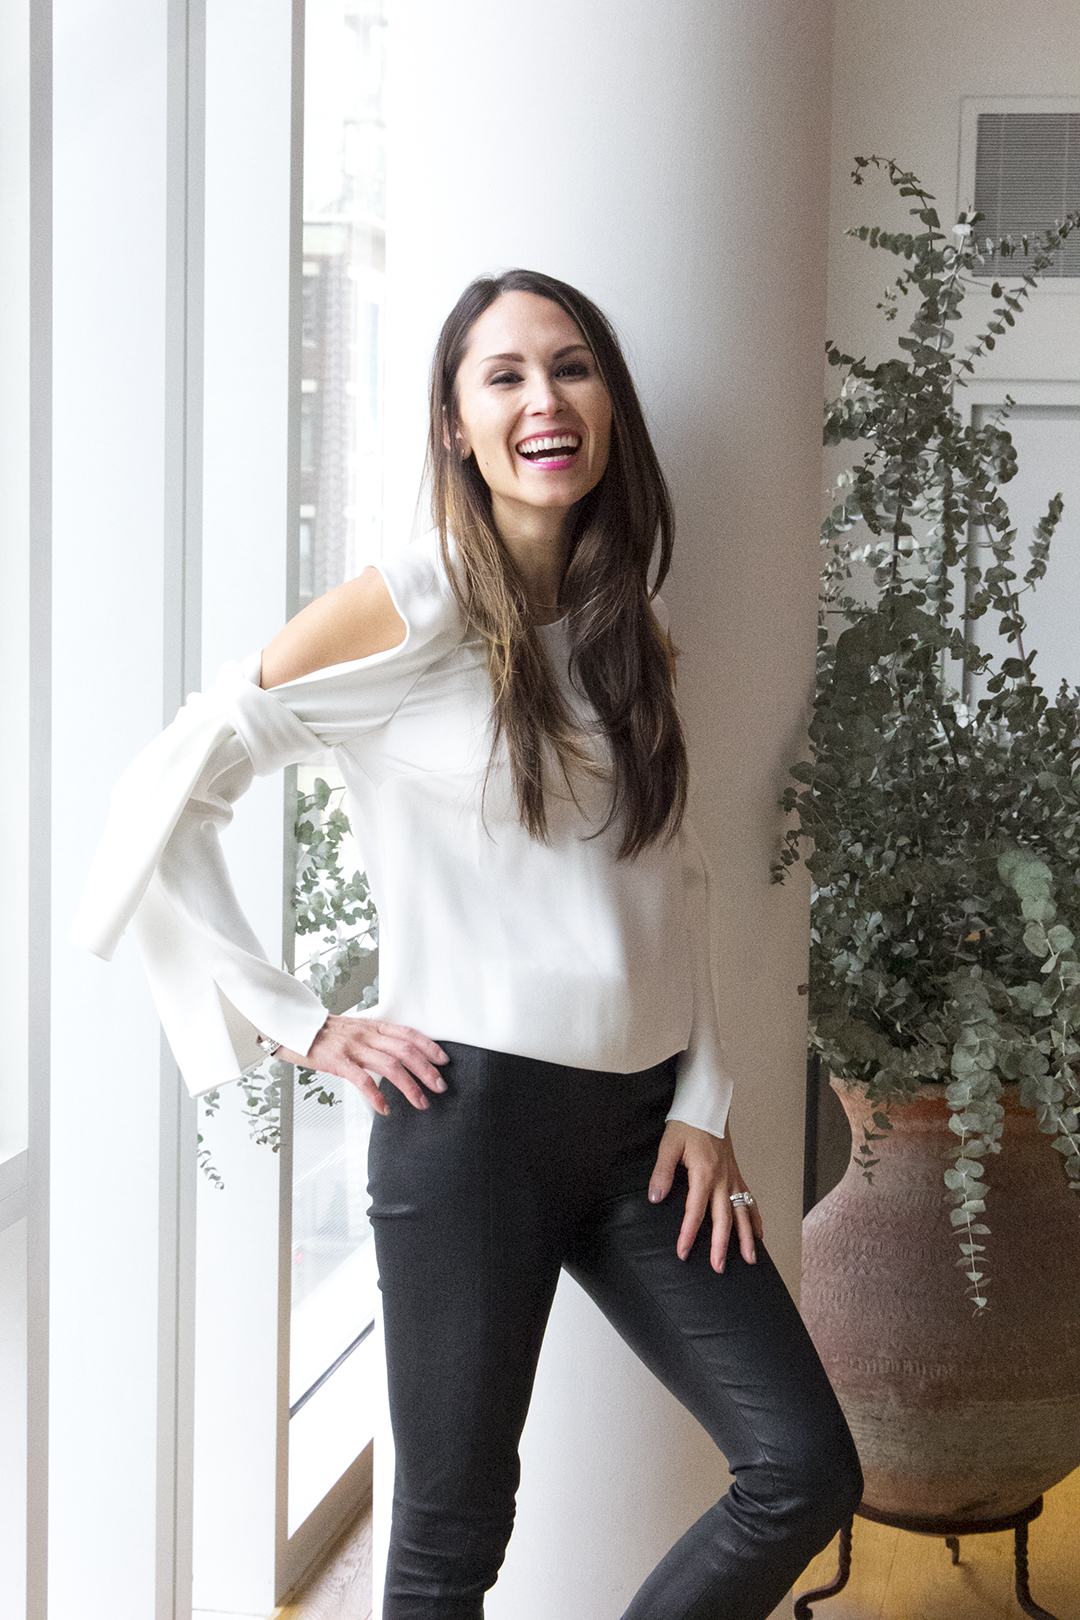 Toreutique Co-founder Jennifer Kapahi